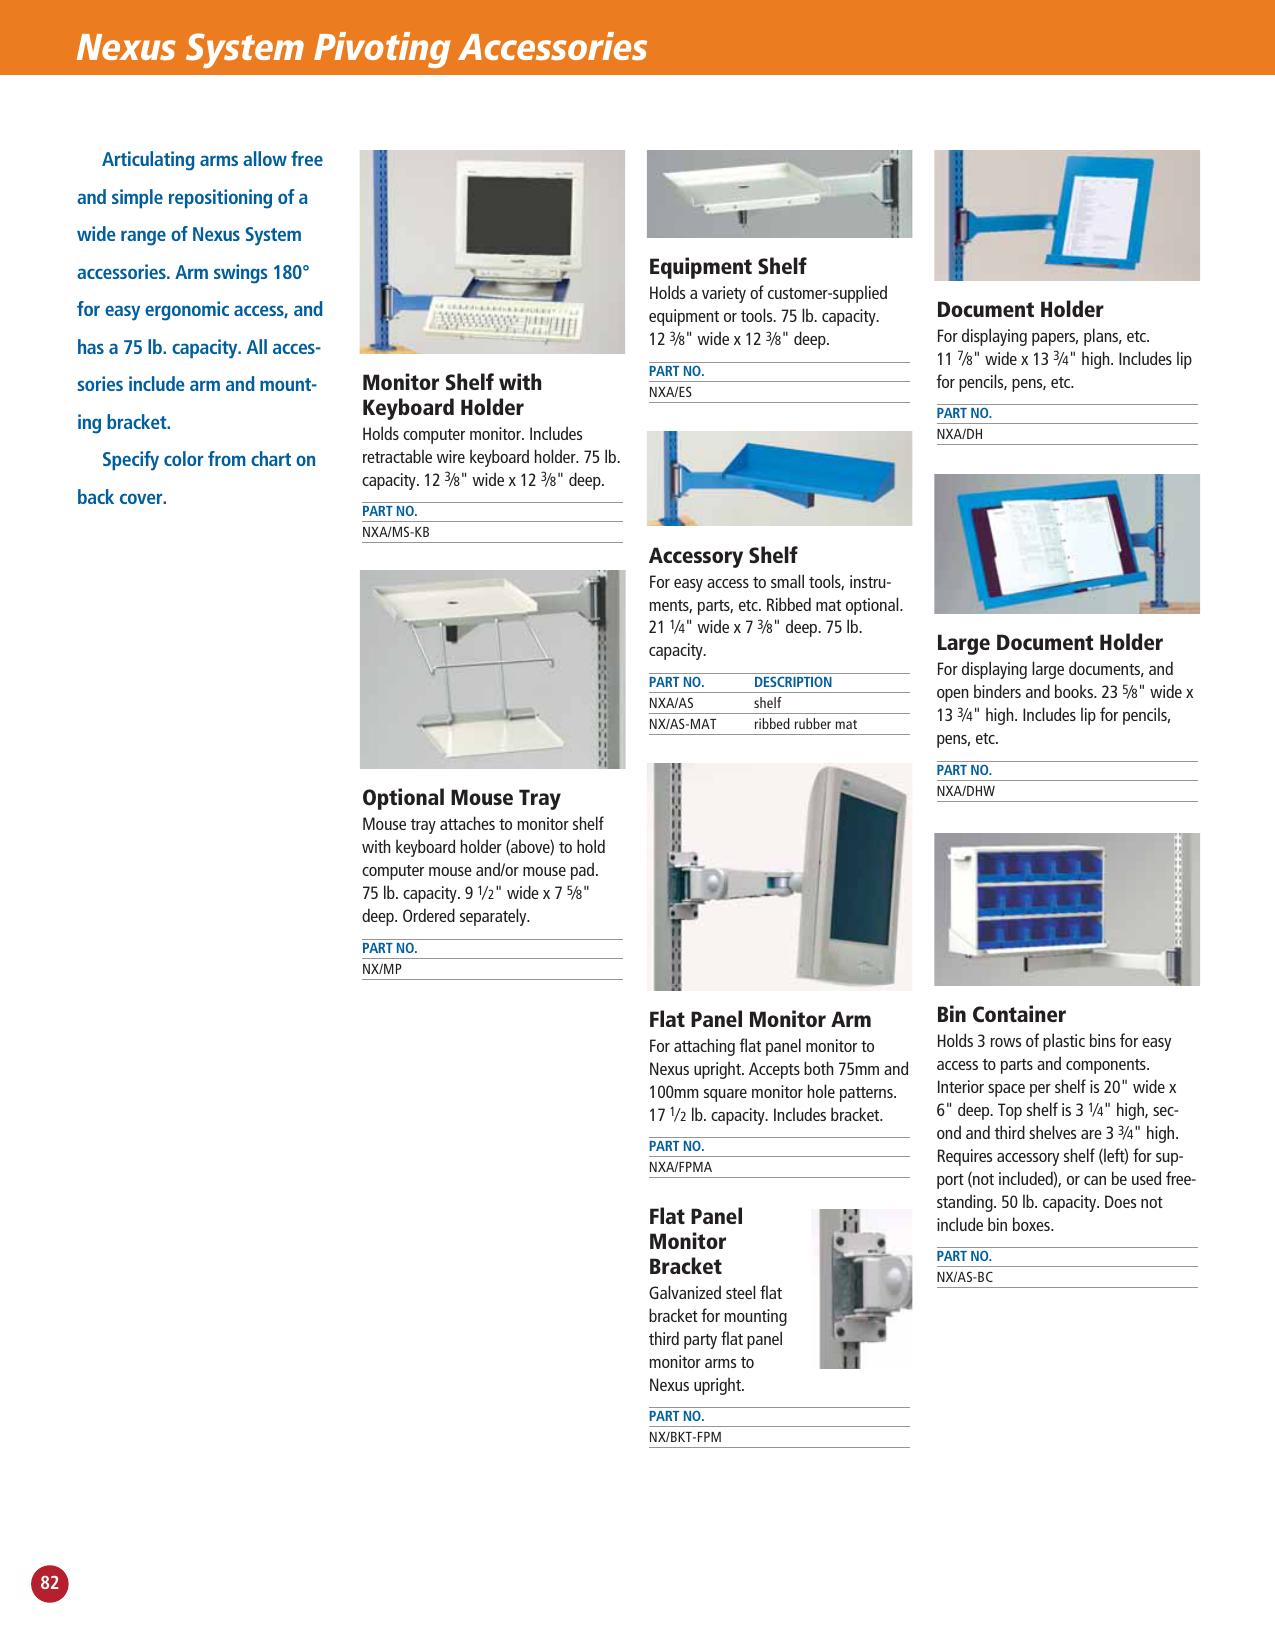 Astounding Lista General Workbench Catalog Nexus Accessory System Creativecarmelina Interior Chair Design Creativecarmelinacom